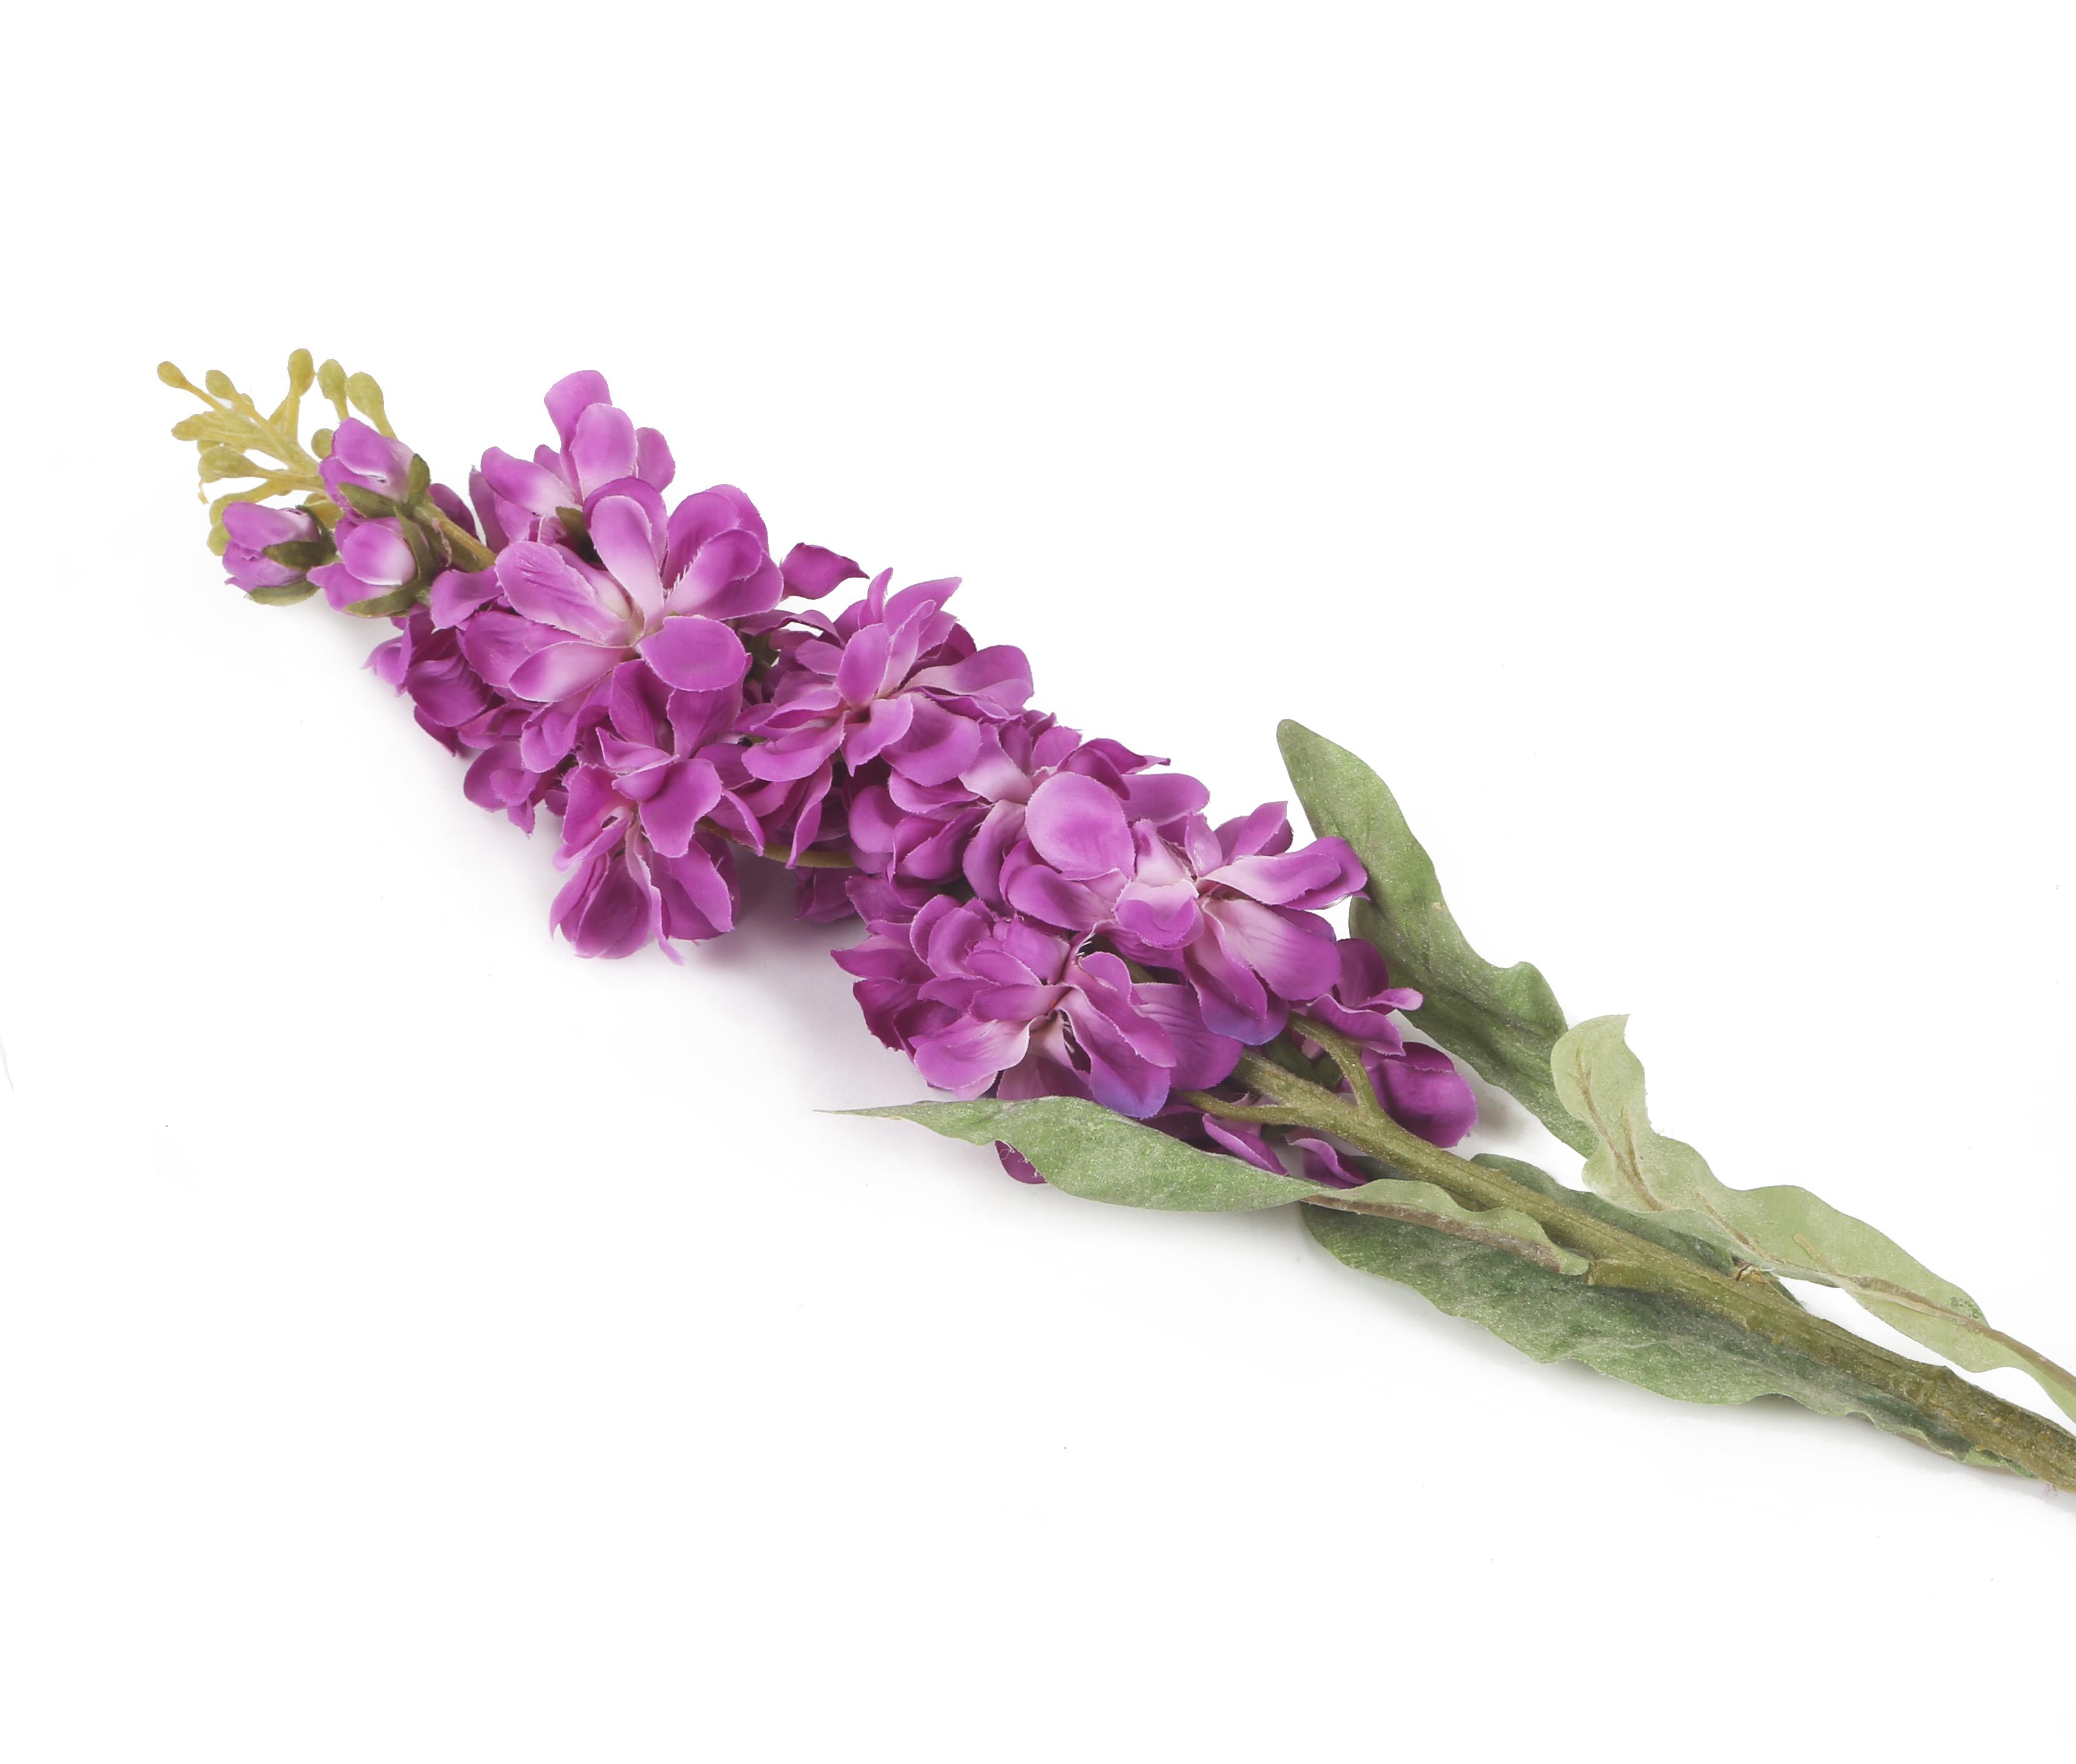 View large Artificial 78cm Single Stem Purple Stock Flowers x 12 - Artificial Luxury Silk Flower Range UK